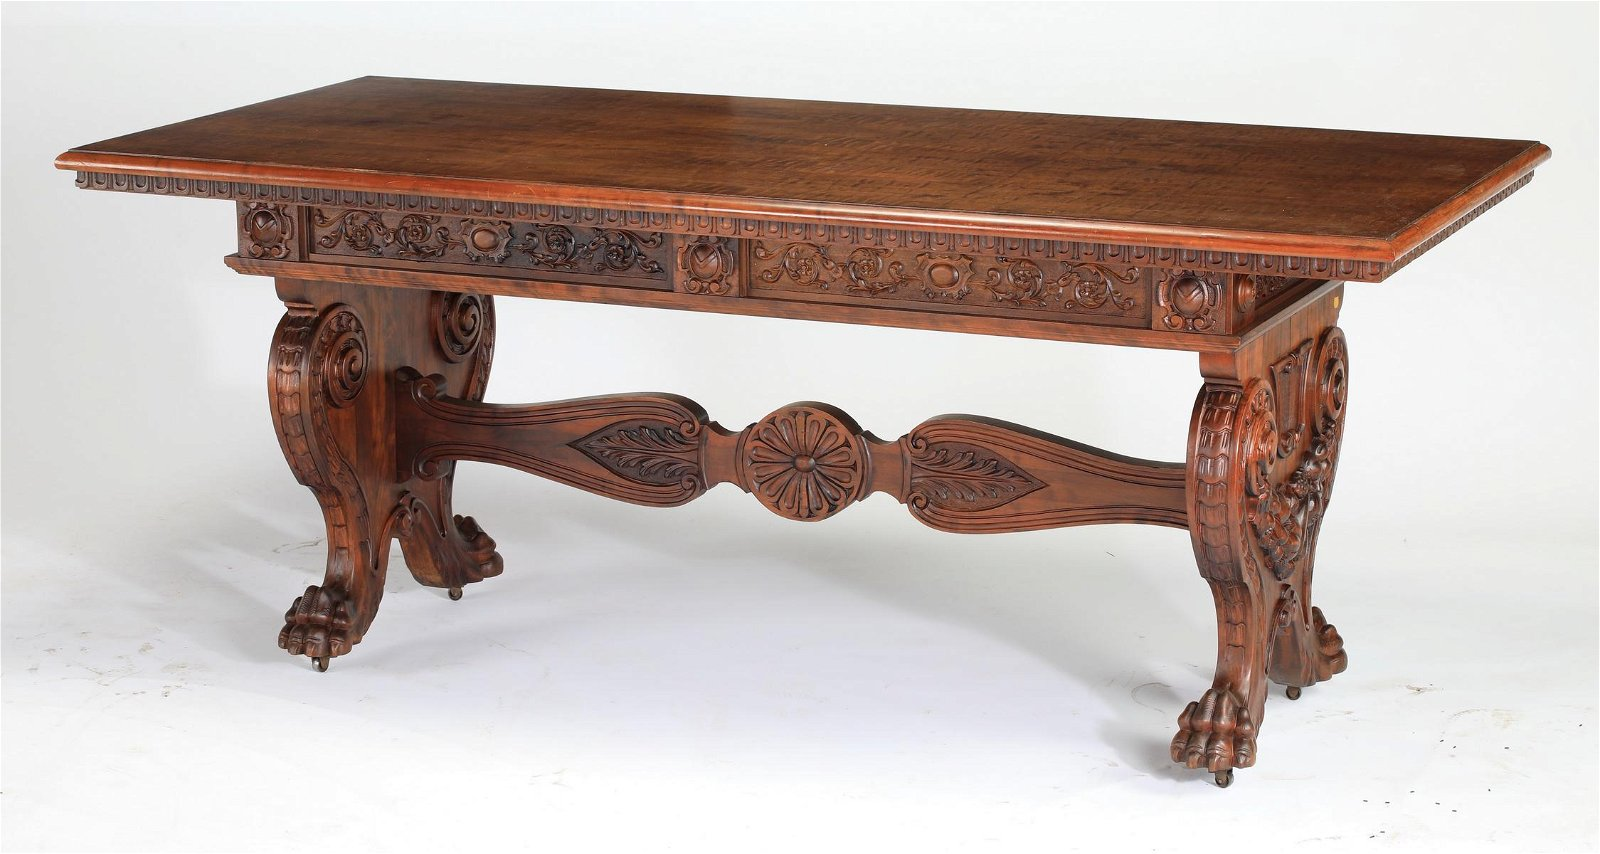 19th c. French carved walnut table w/ paw feet